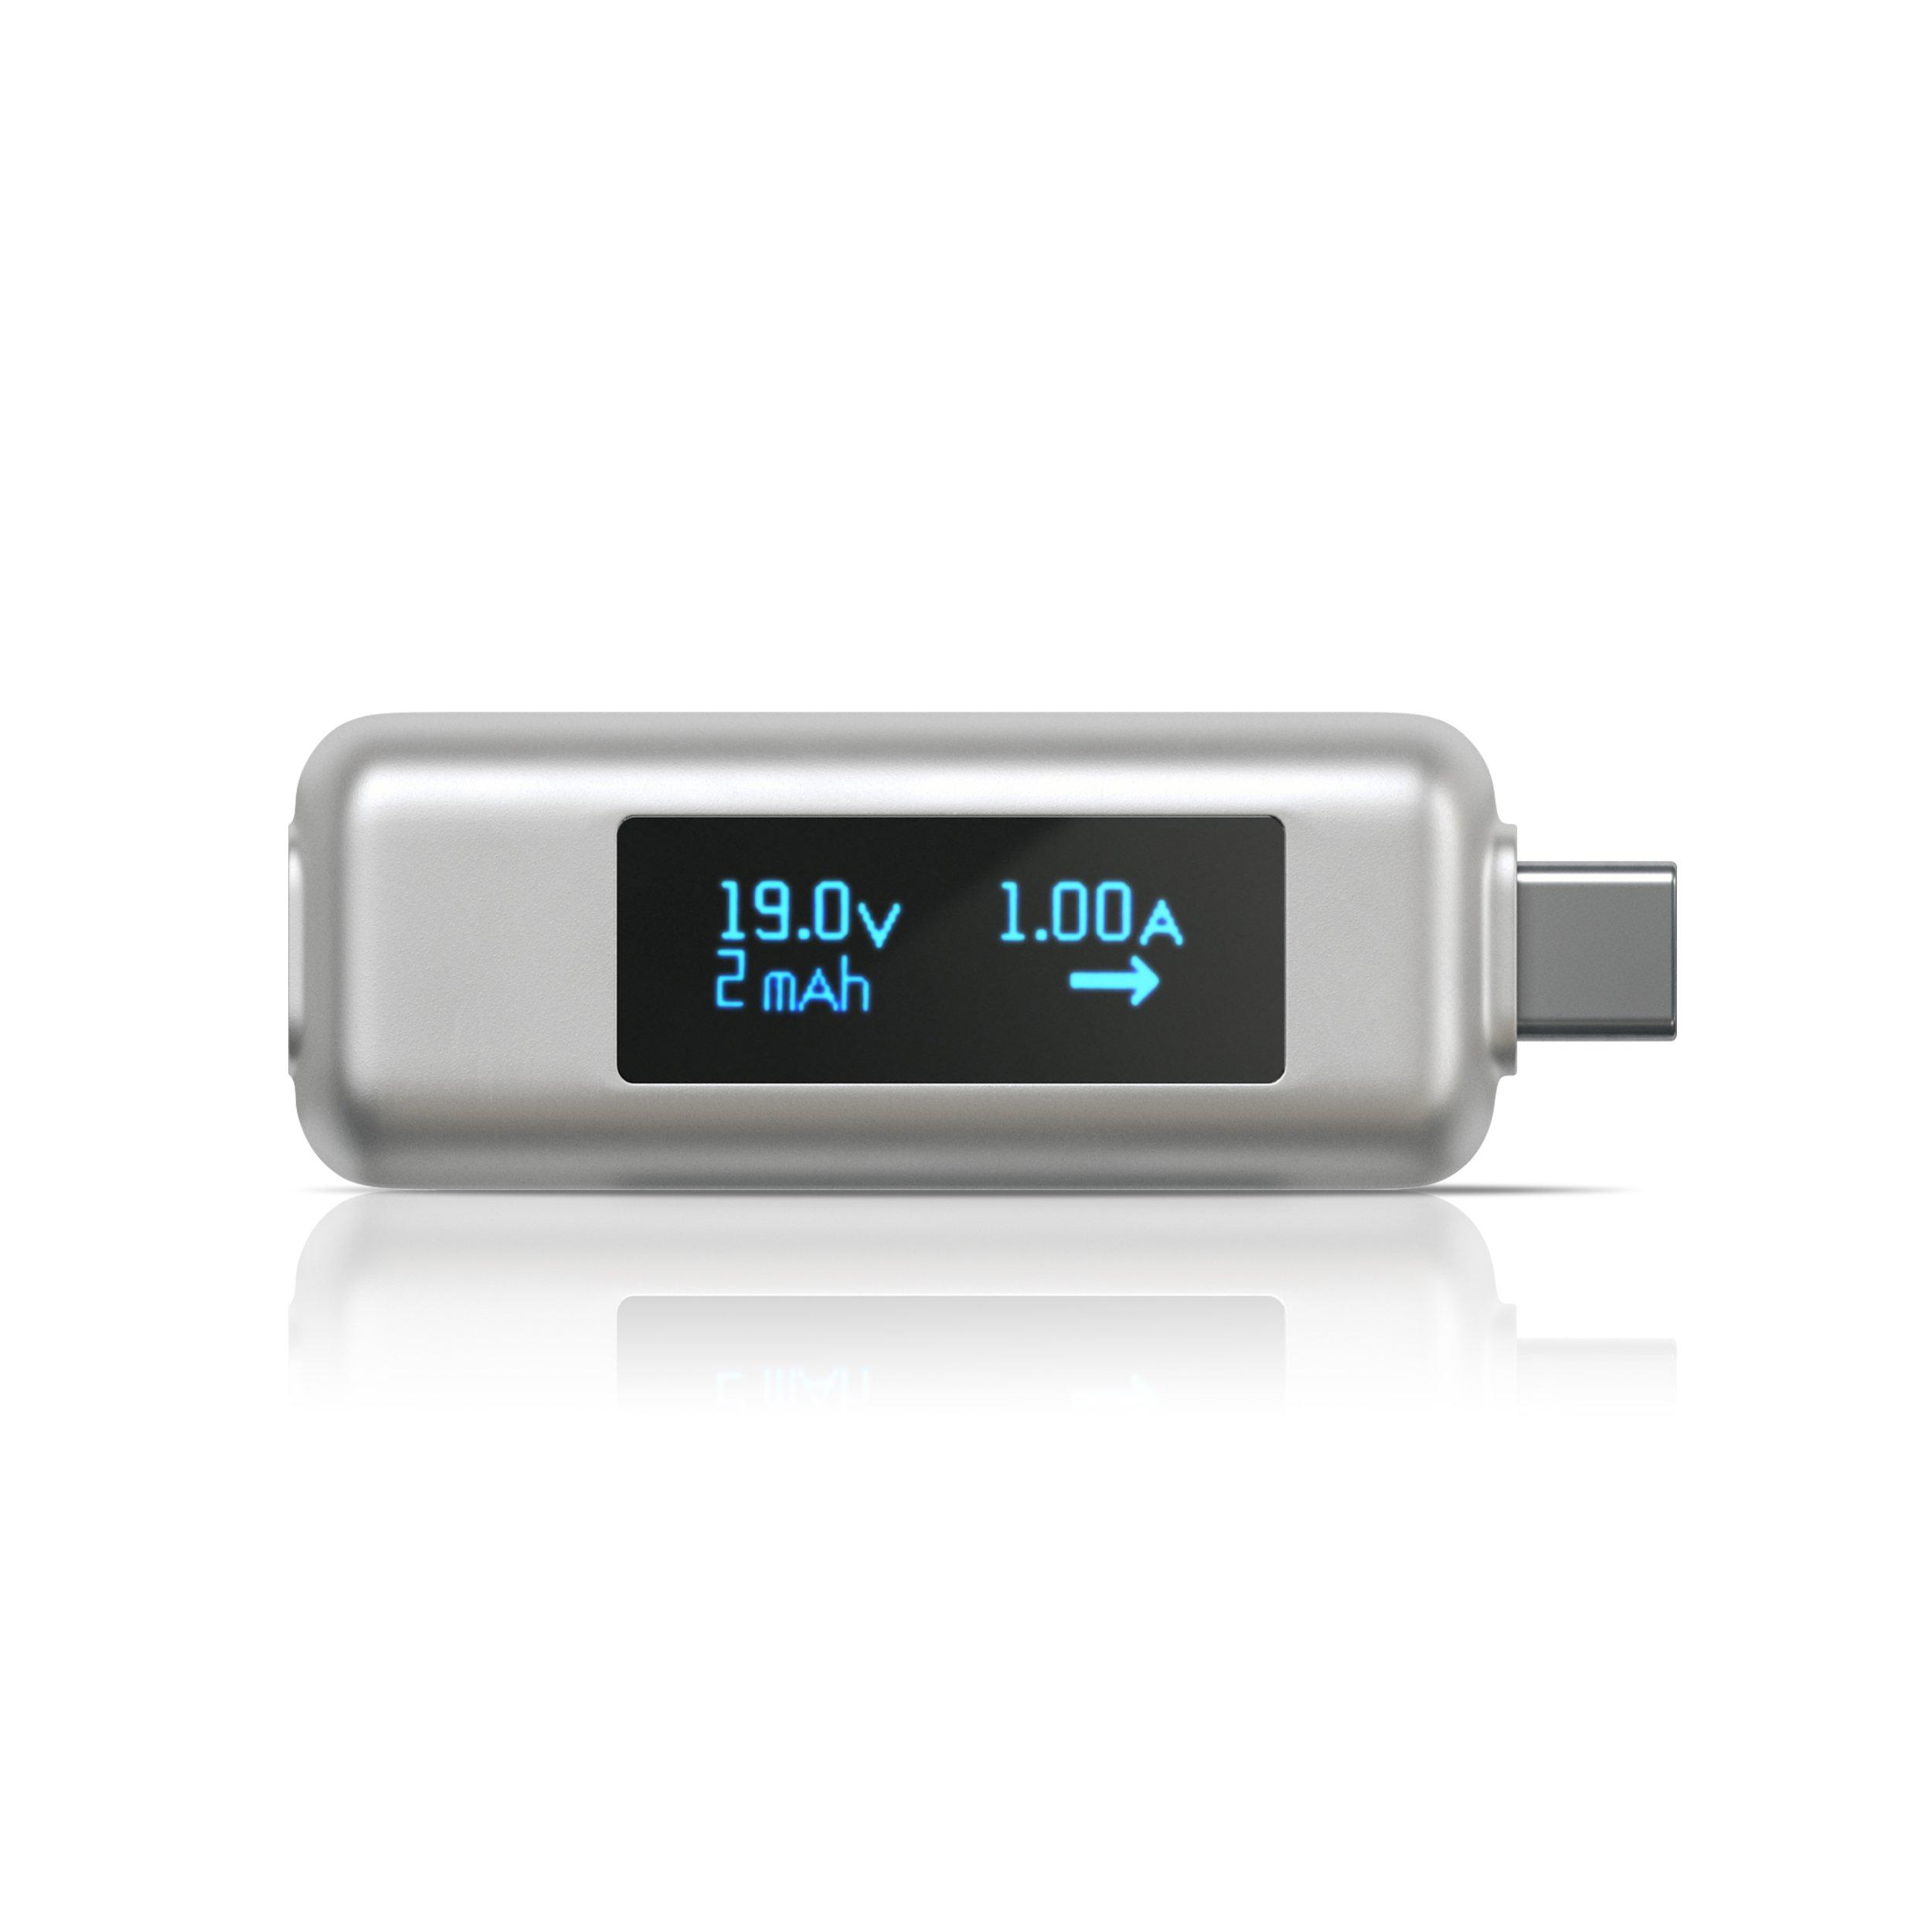 Satechi USB-C Power Meter Tester Multimeter for 2016/2017/2018 MacBook Pro, 2015/2016/2017 MacBook, iMac Pro, 2017 iMac, Lenovo Yoga, Dell XPS, HP Specte x360, Samsung S9 Plus, S9, S8 and more